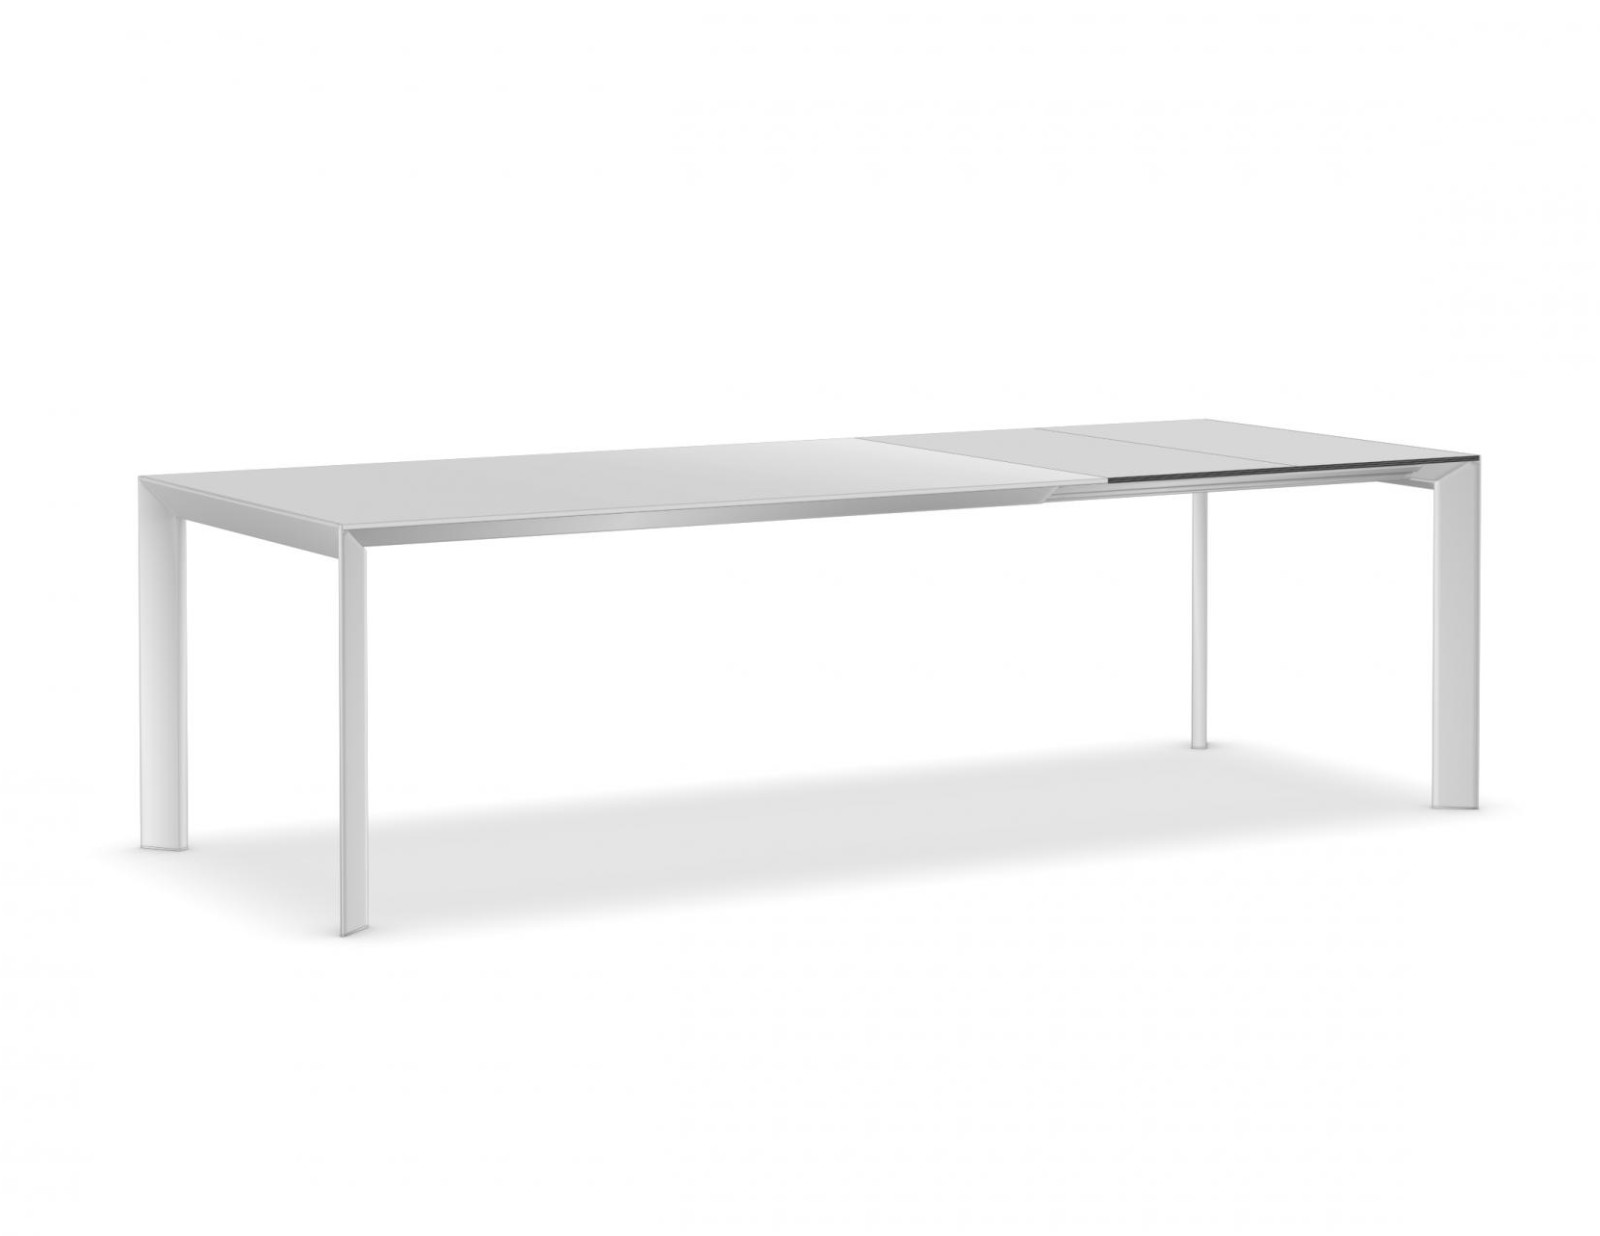 Nori glass Extensible - Depth 100 cm 189-236-283, Anodised Aluminium, Gloss glass: Extra White, Aluc